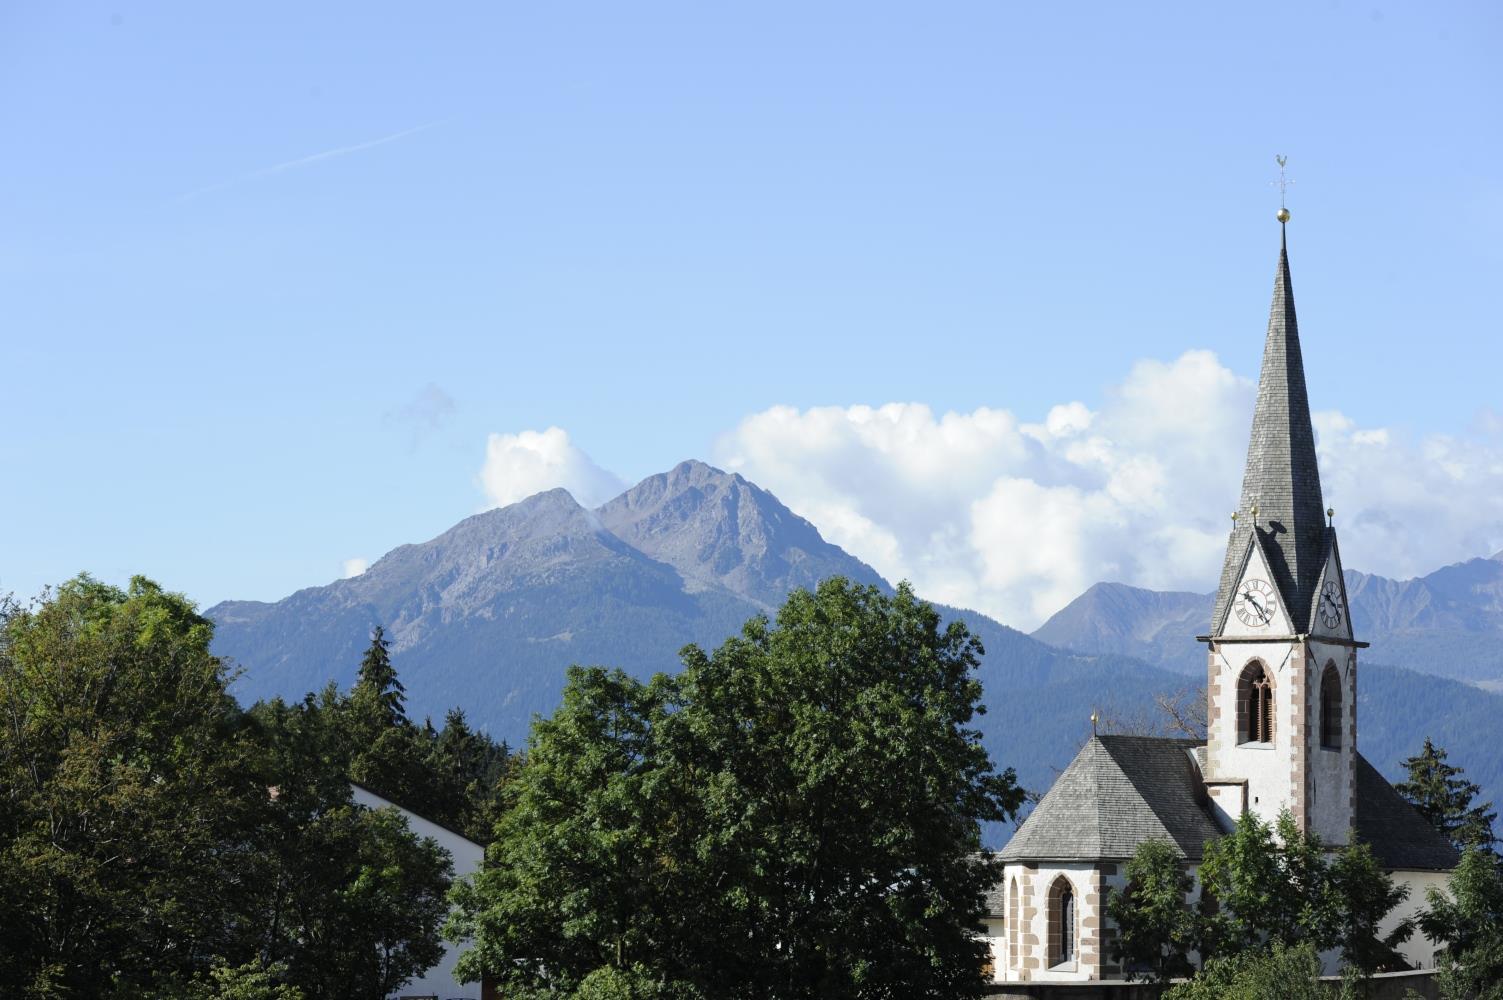 Pfarrkirche zum Hl. Johann in Hafling